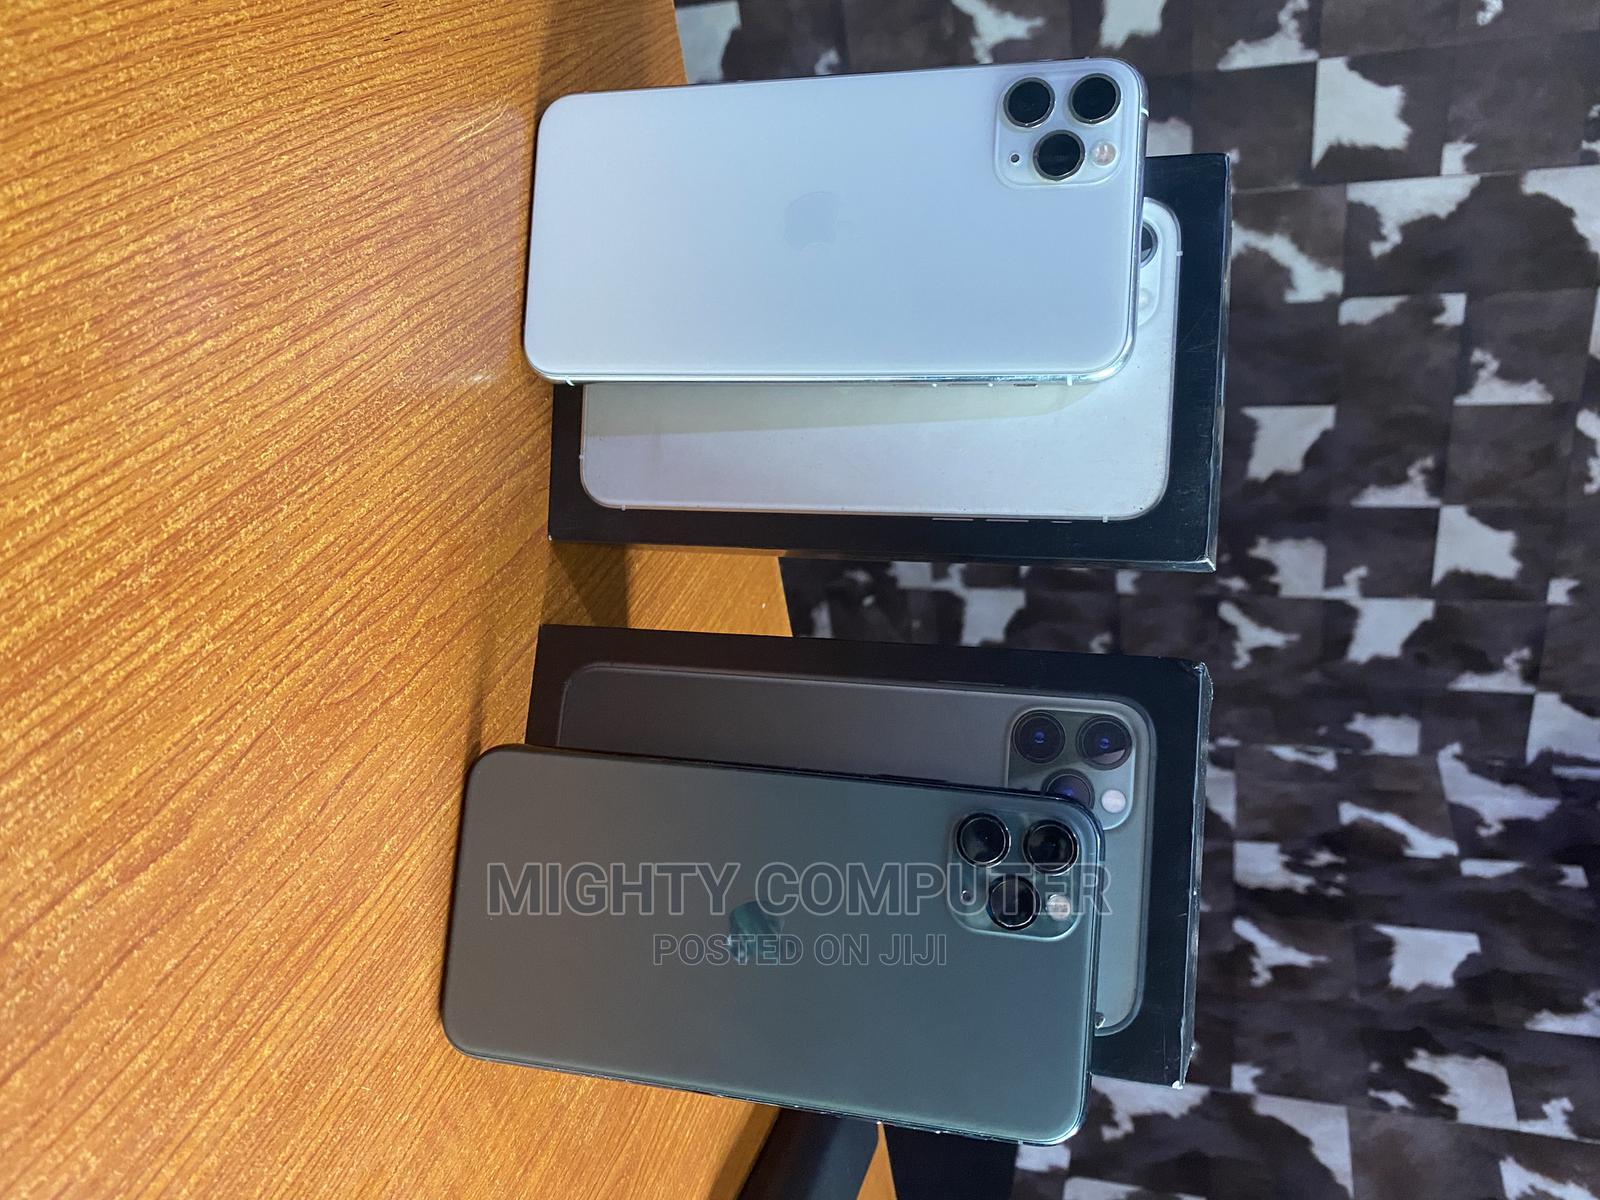 Apple iPhone 11 Pro 256 GB | Mobile Phones for sale in Osogbo, Osun State, Nigeria